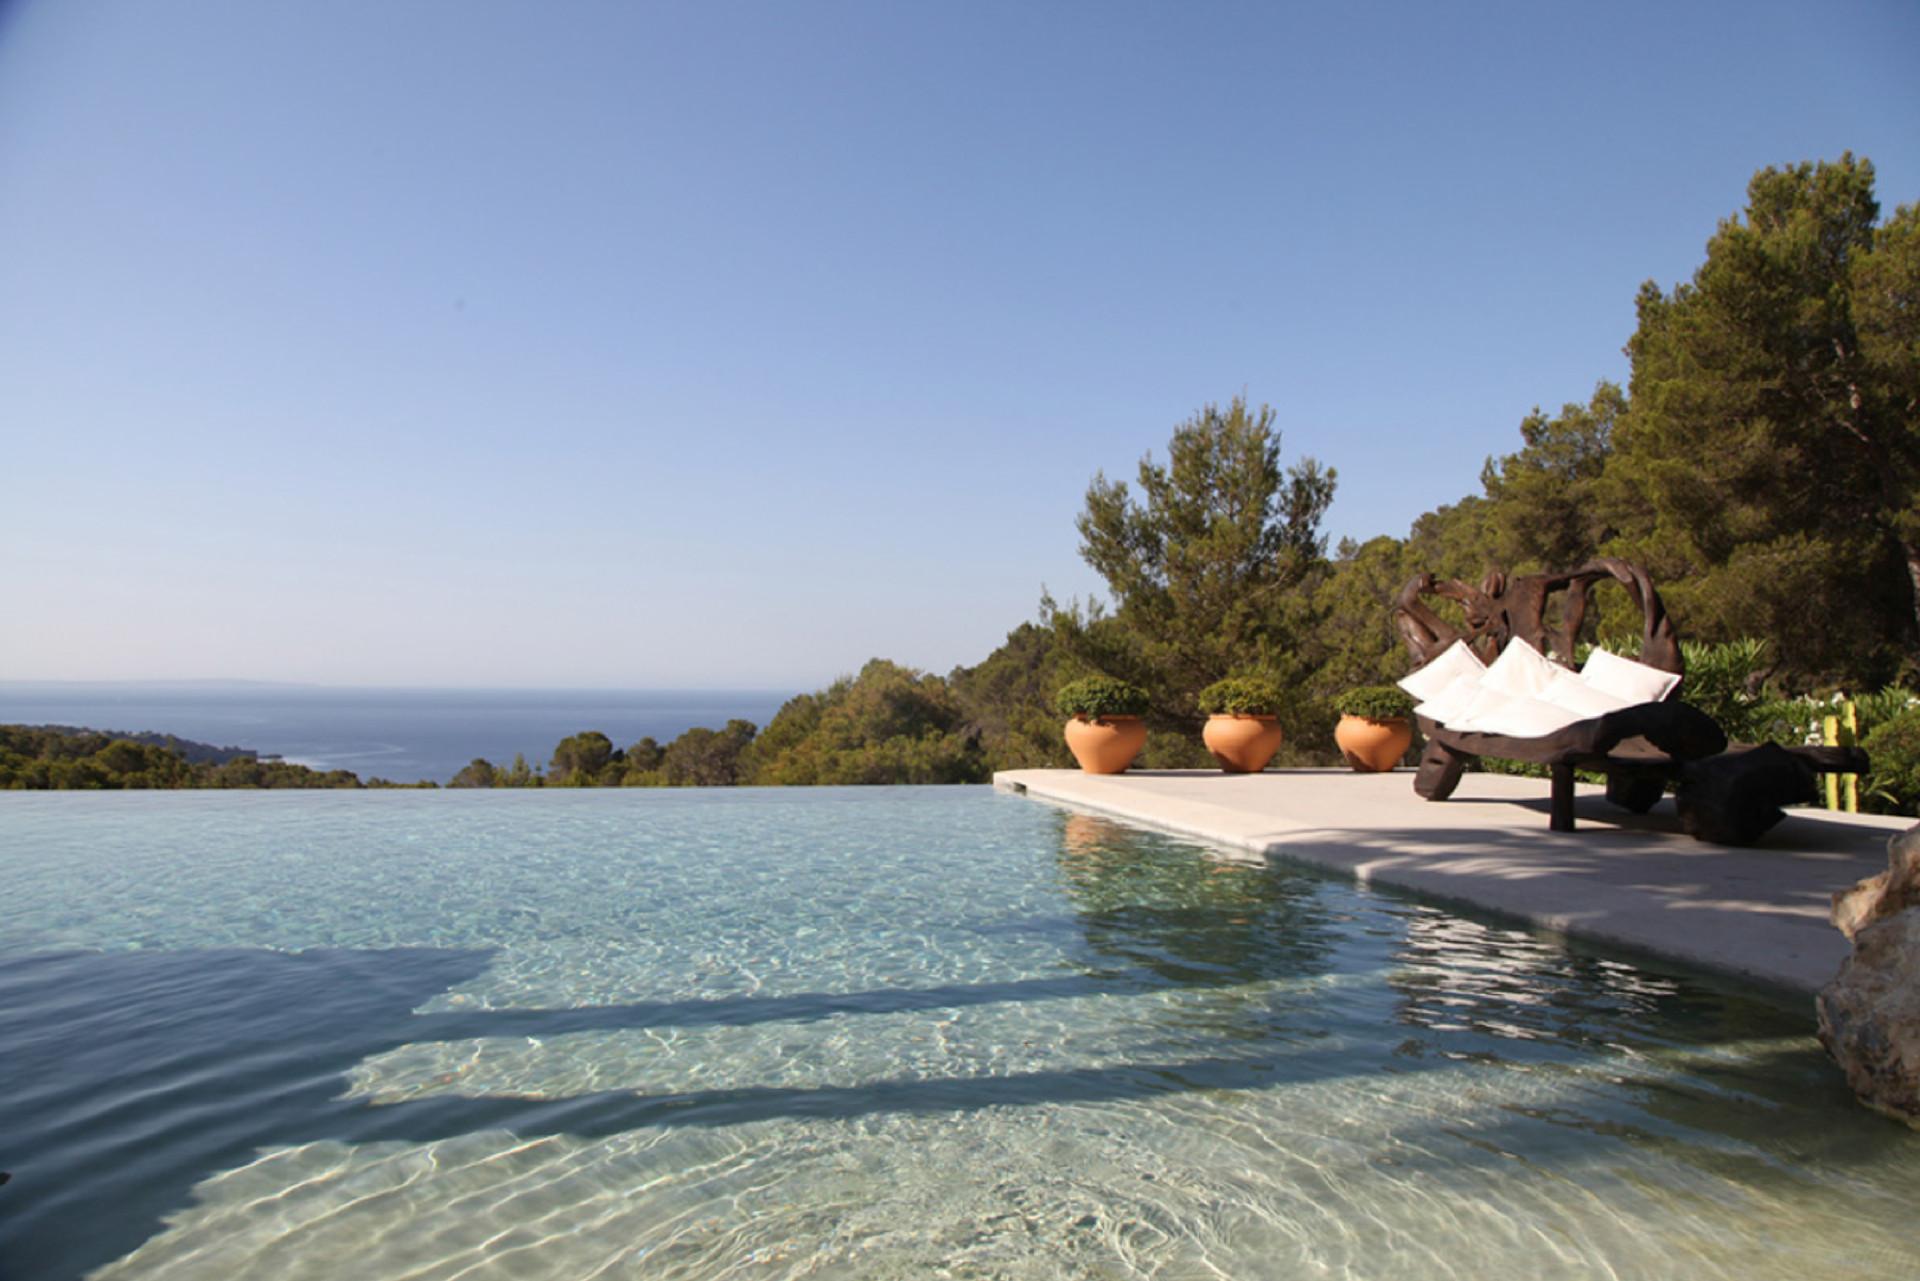 Villas rentals in ibiza villa rental ibiza houses in ibiza - Ibiza house renting ...